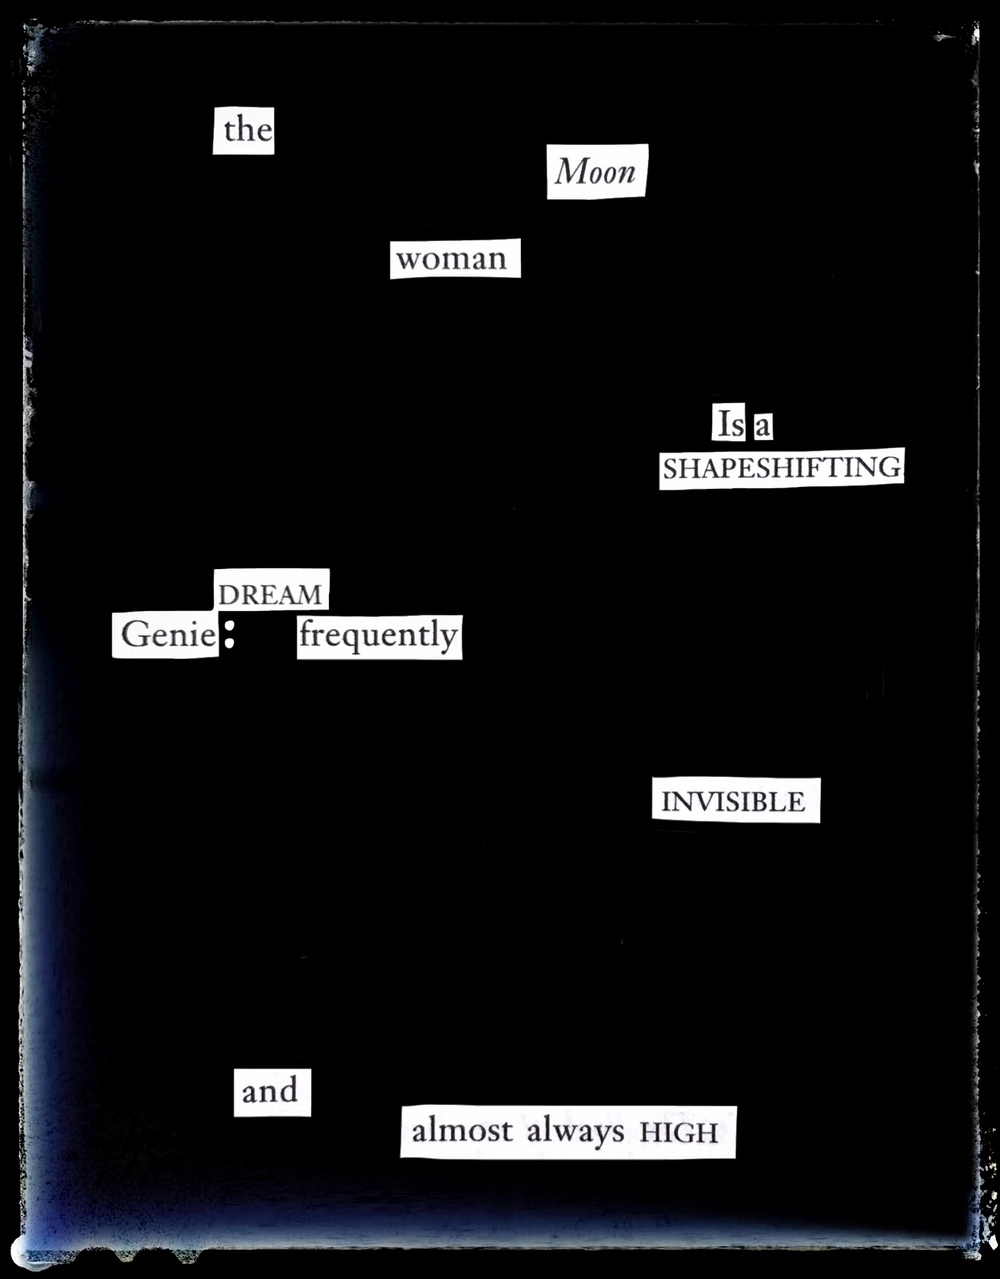 The Moon Woman,Divyam Bernstein, 2016